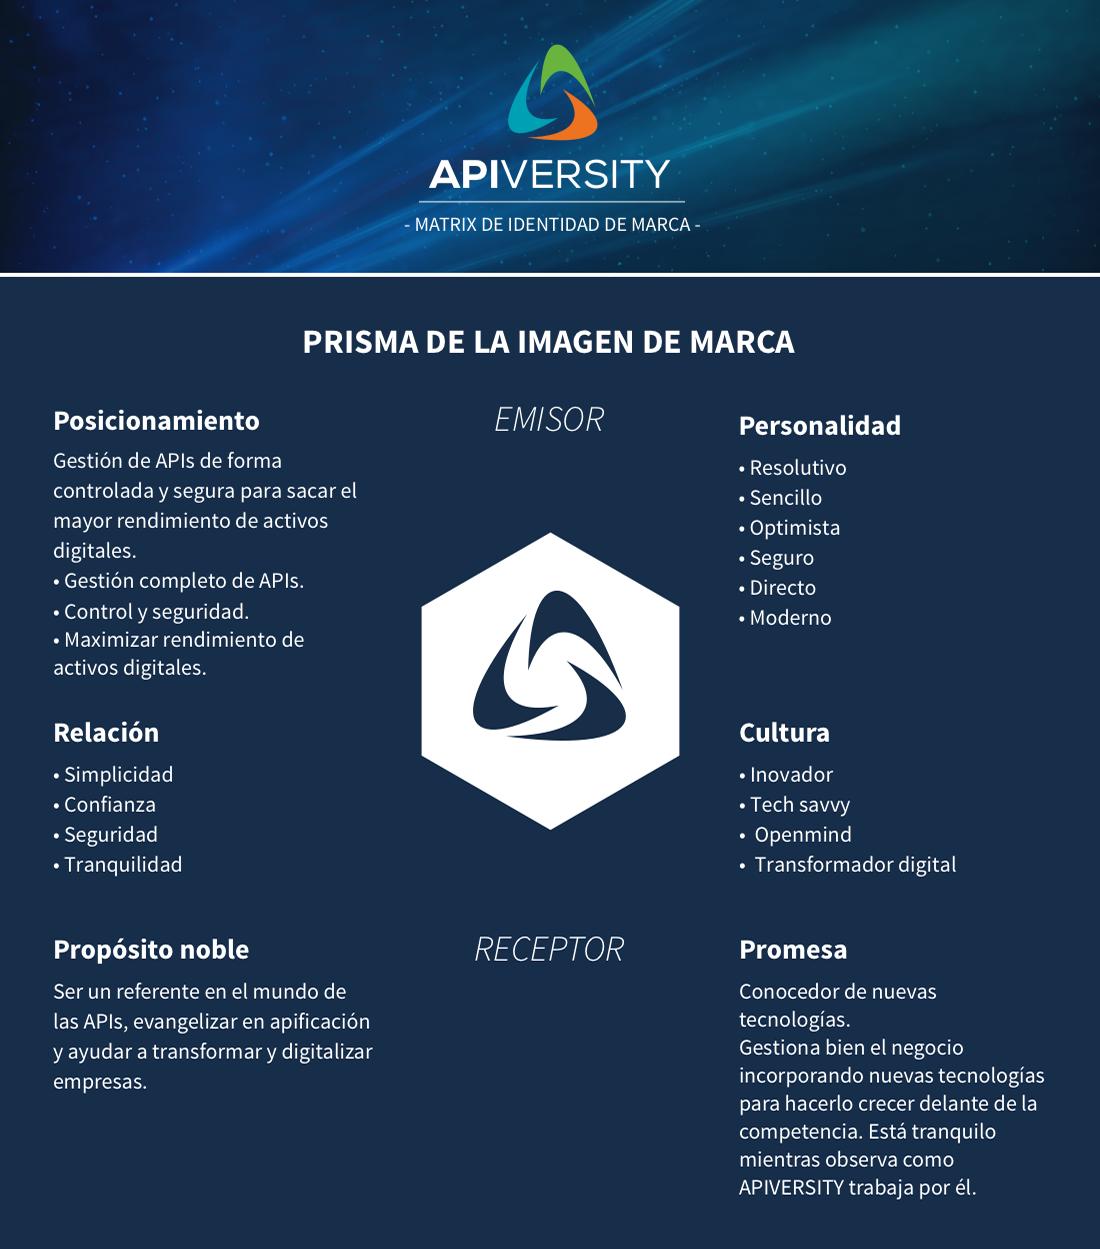 APIVERSITY_Brand-Matrix1